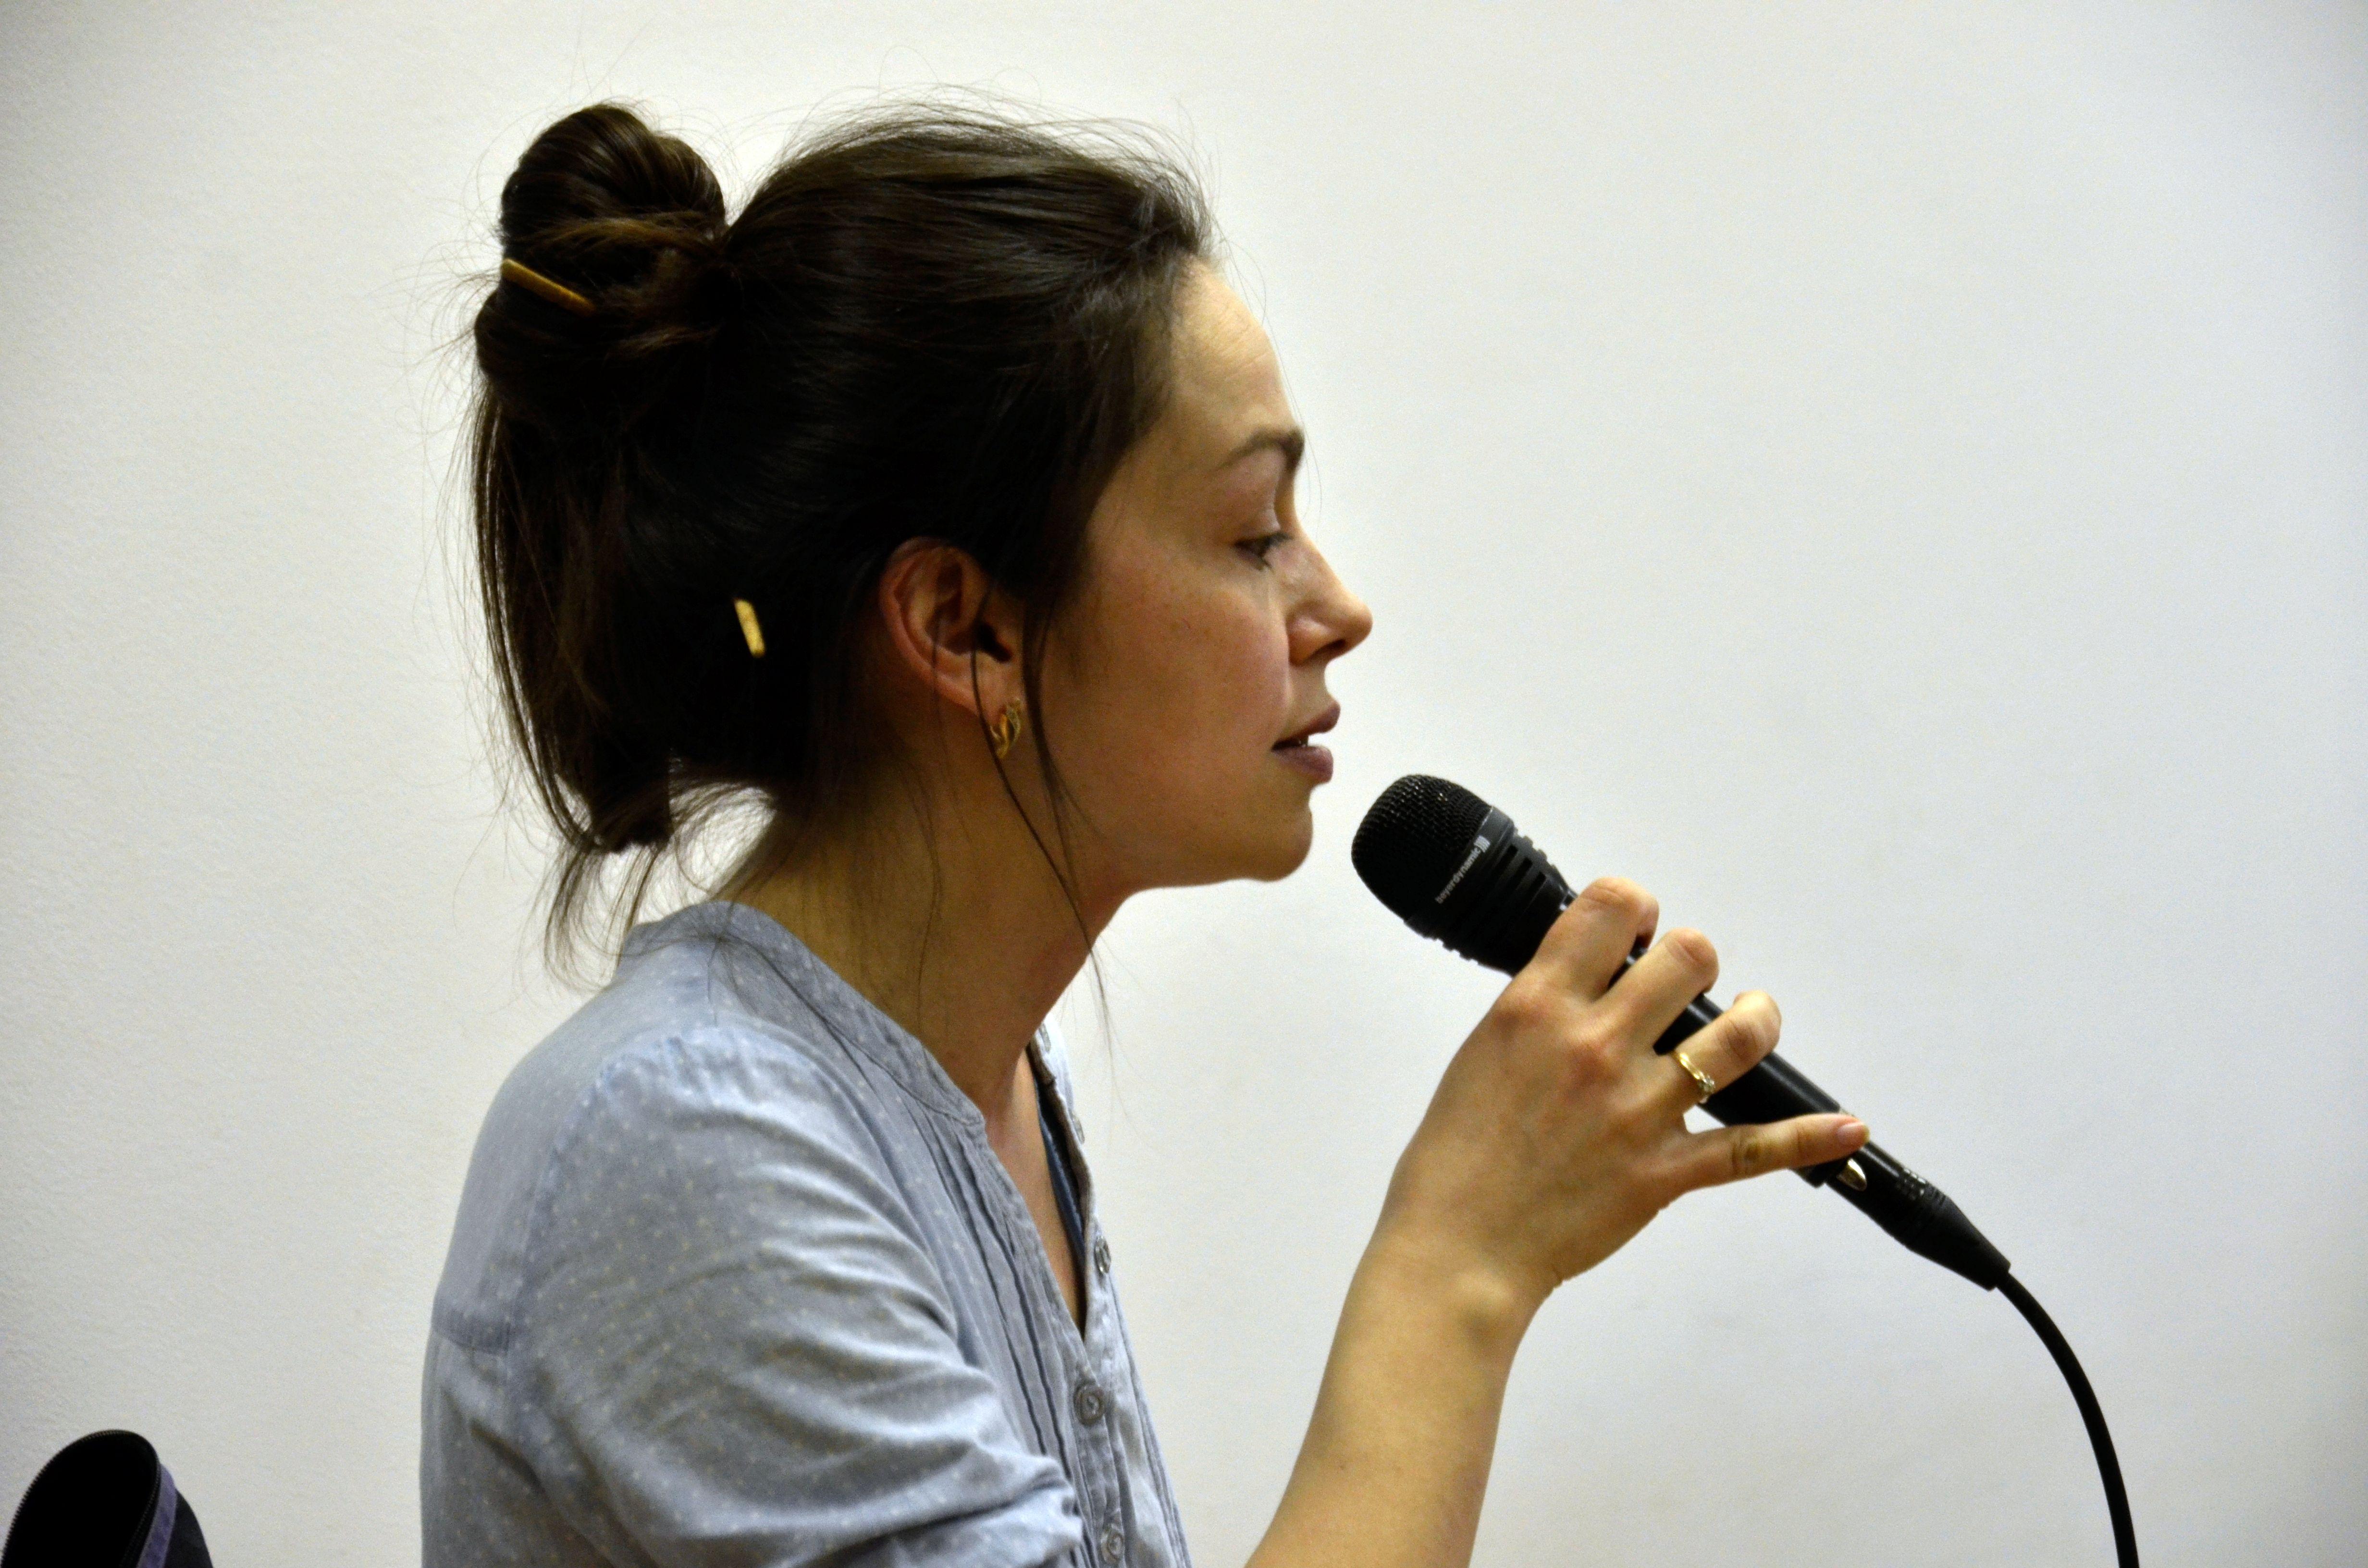 До-ре-ми: онлайн-урок по вокалу провели сотрудники Дома культуры «Коммунарка»